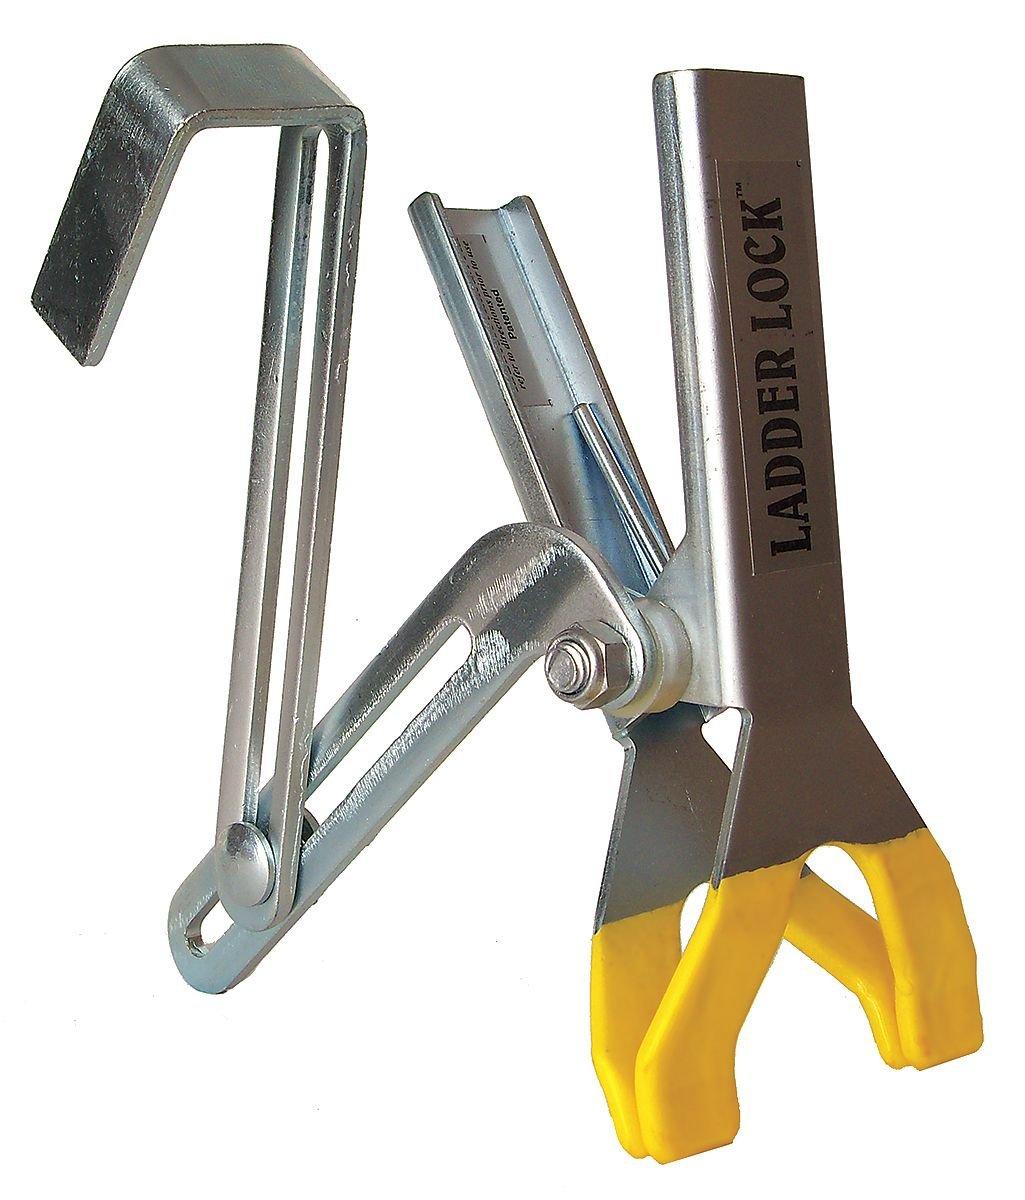 Ladder Lock, Steel, Trivalent Coating by LADDER LOCK